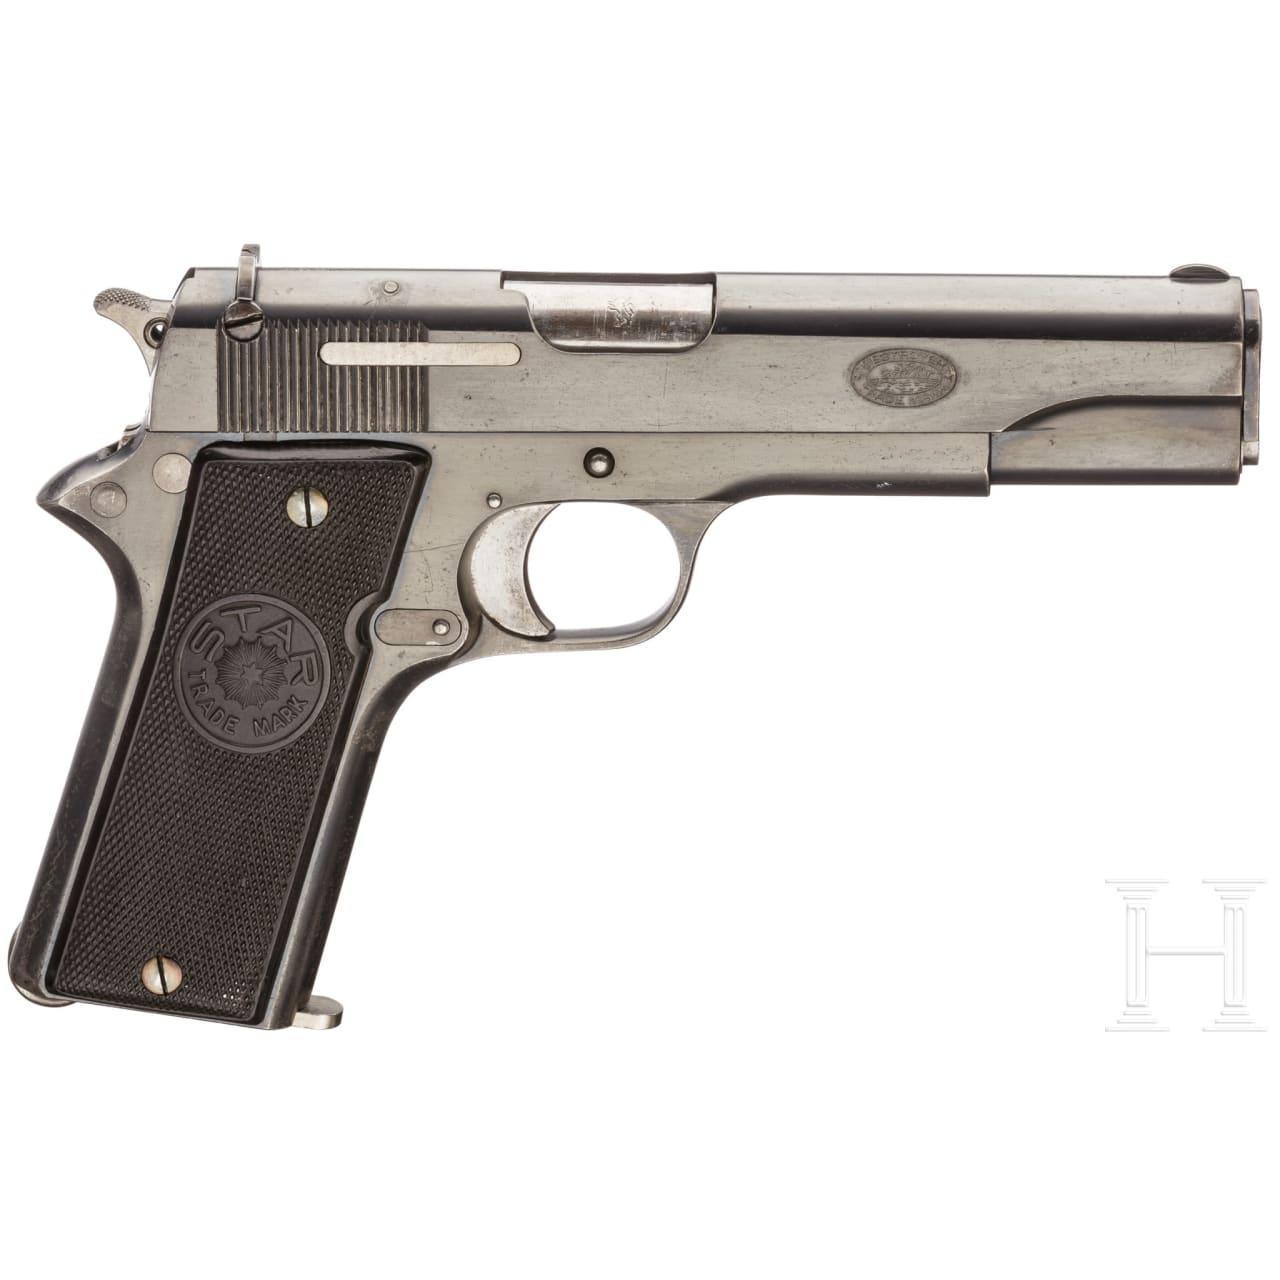 "Star Mod. A, auch ""Modelo Militar 1922"" oder Mod. P im Kal. .45 ACP"